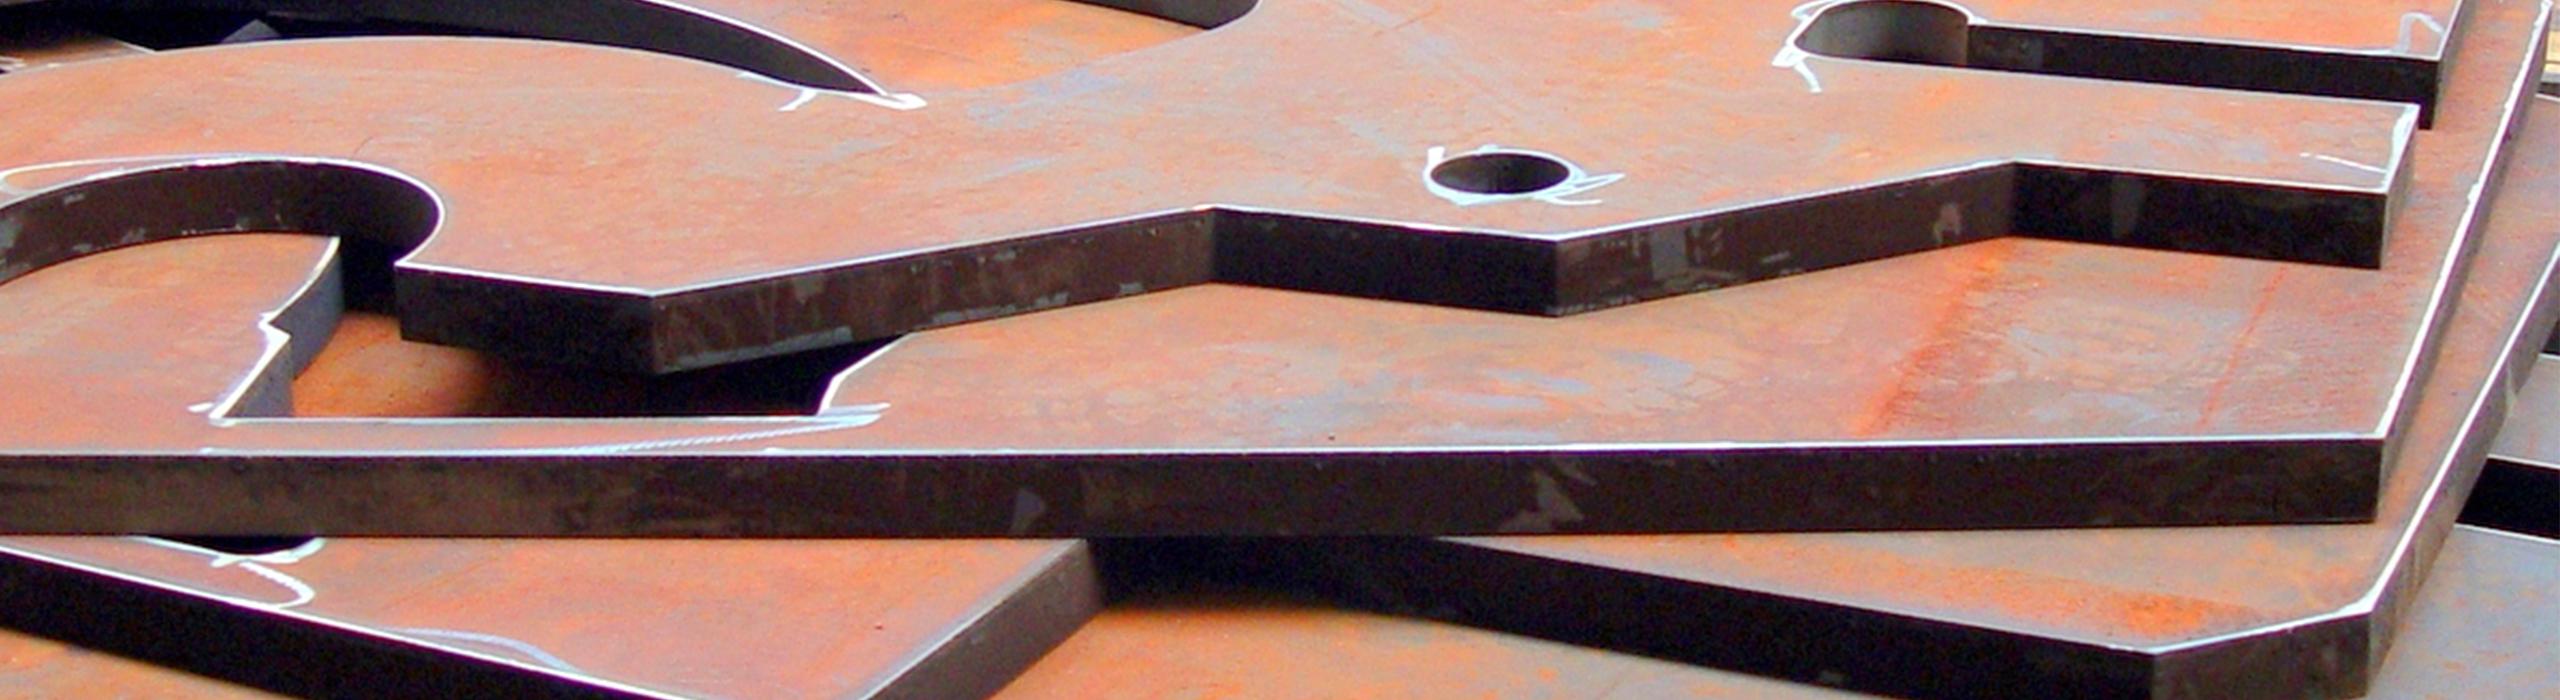 RSB-Stahl-header2-brennbetrieb